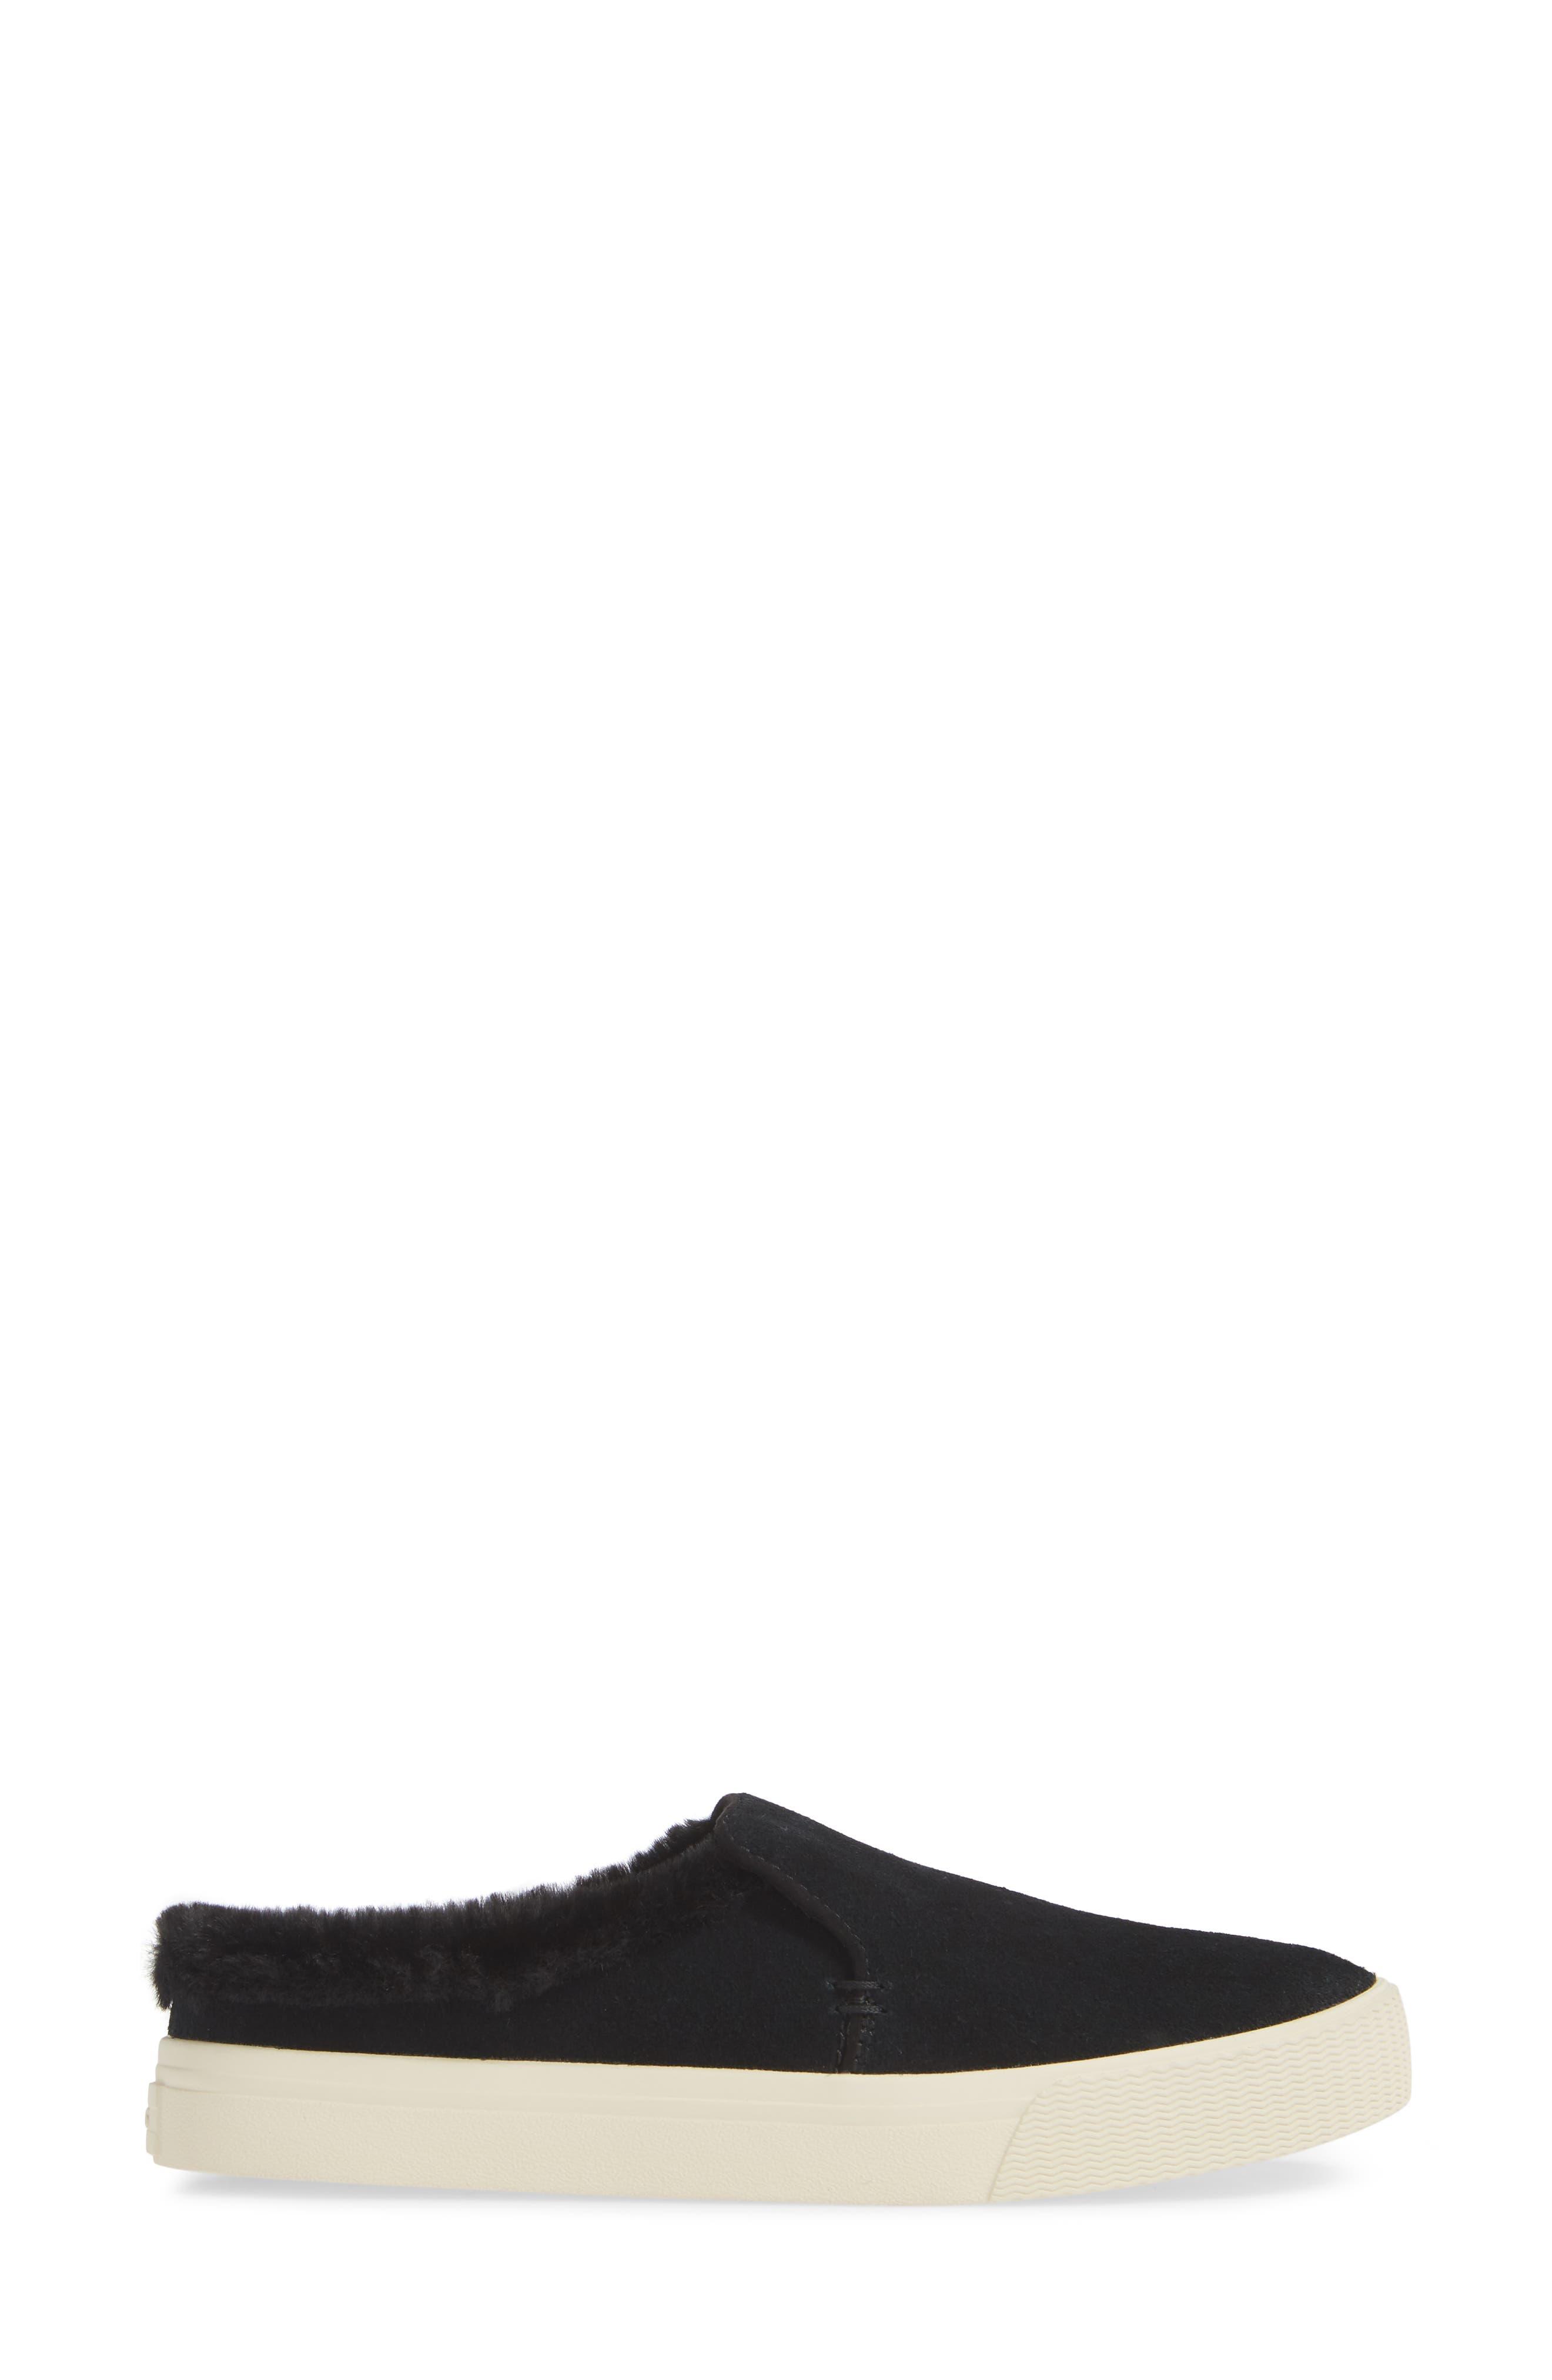 TOMS, Sunrise Faux Fur Lined Slip-On Sneaker, Alternate thumbnail 3, color, BLACK SUEDE